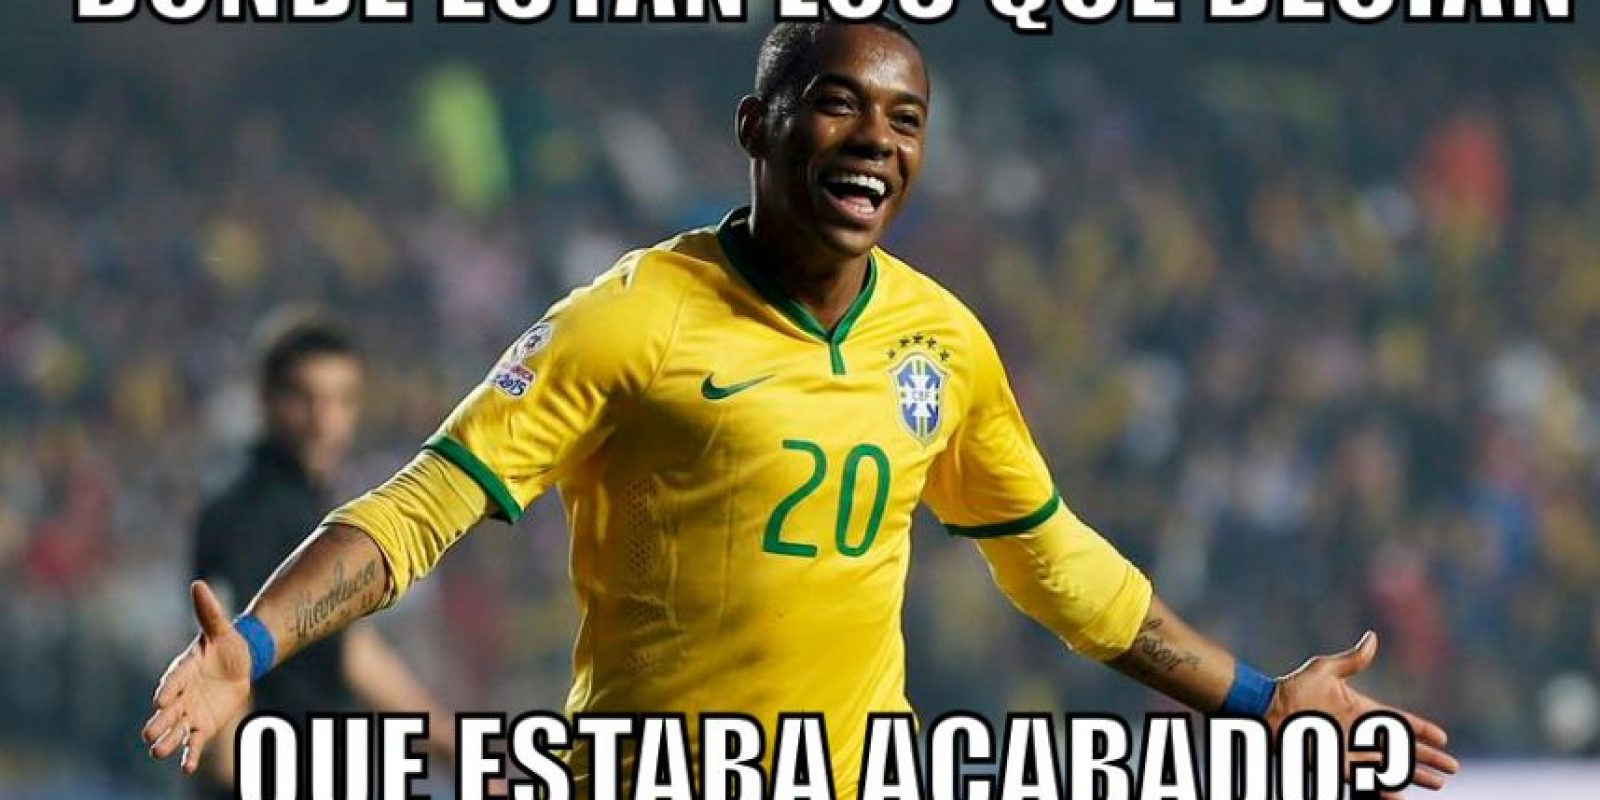 Pues con gol de Robinho, Brasil ganaba 1-0. Foto:Vía twitter.com